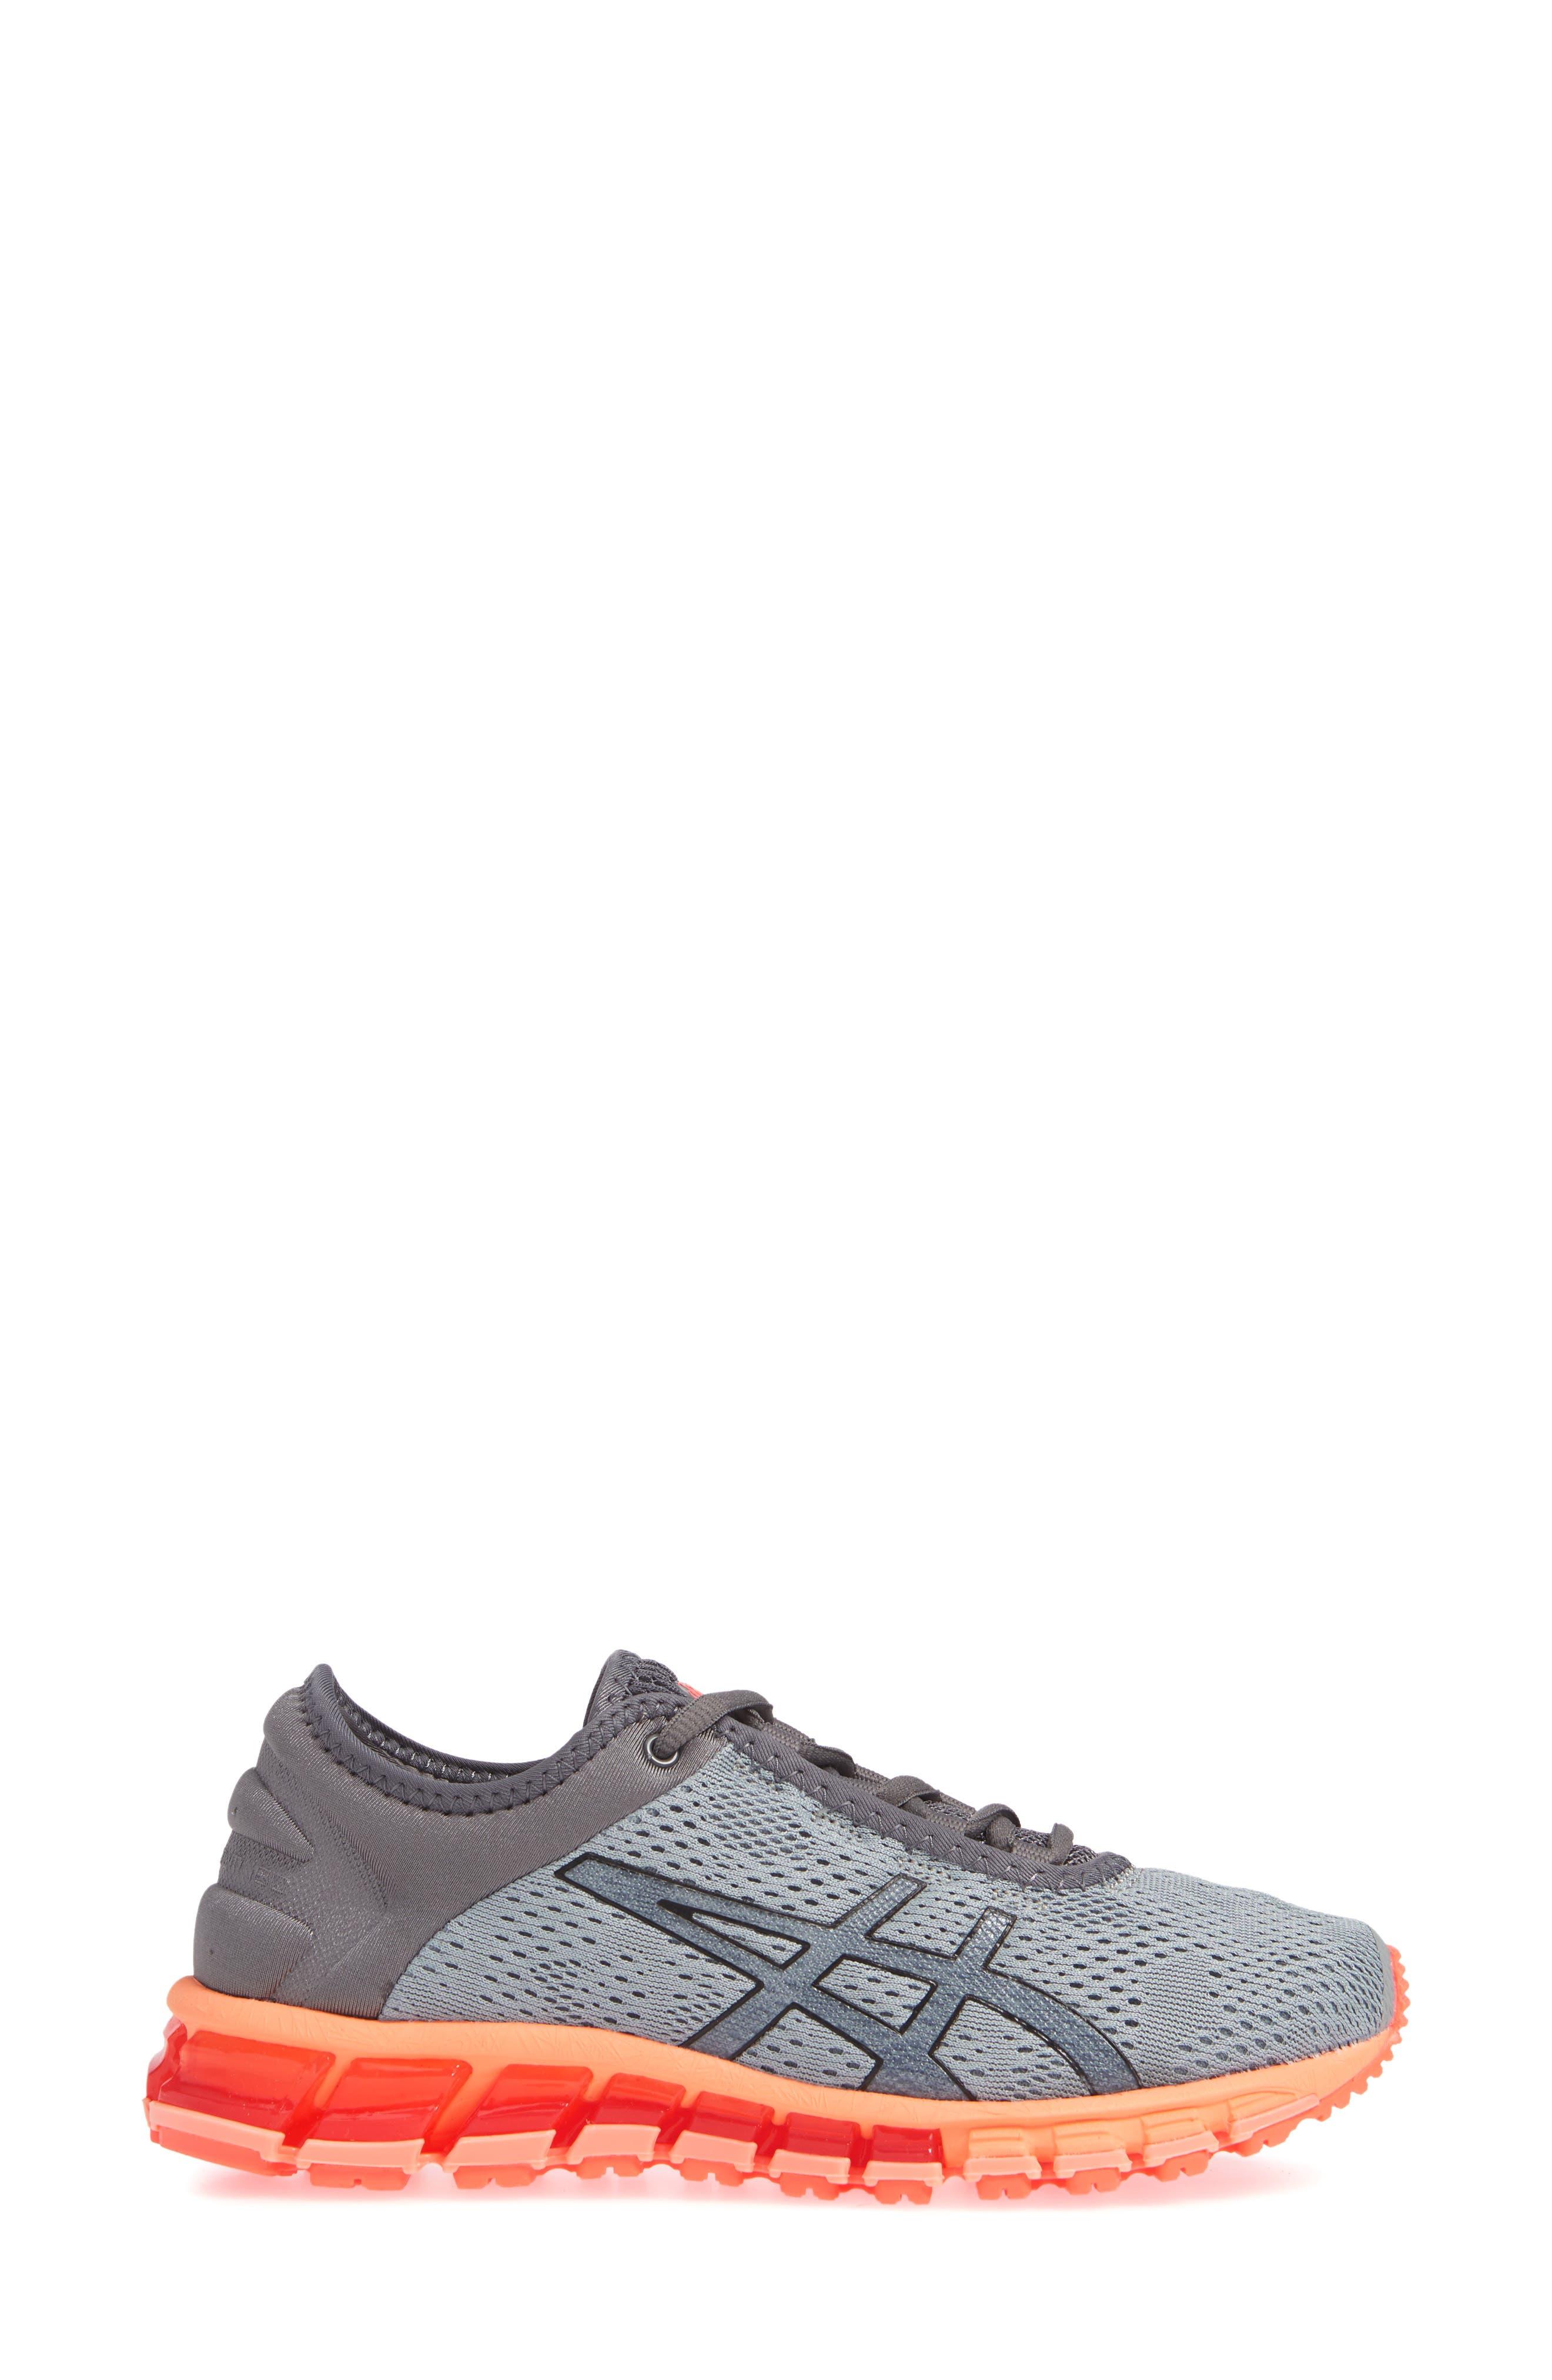 GEL Quantum 180 3 Running Shoe,                             Alternate thumbnail 3, color,                             020